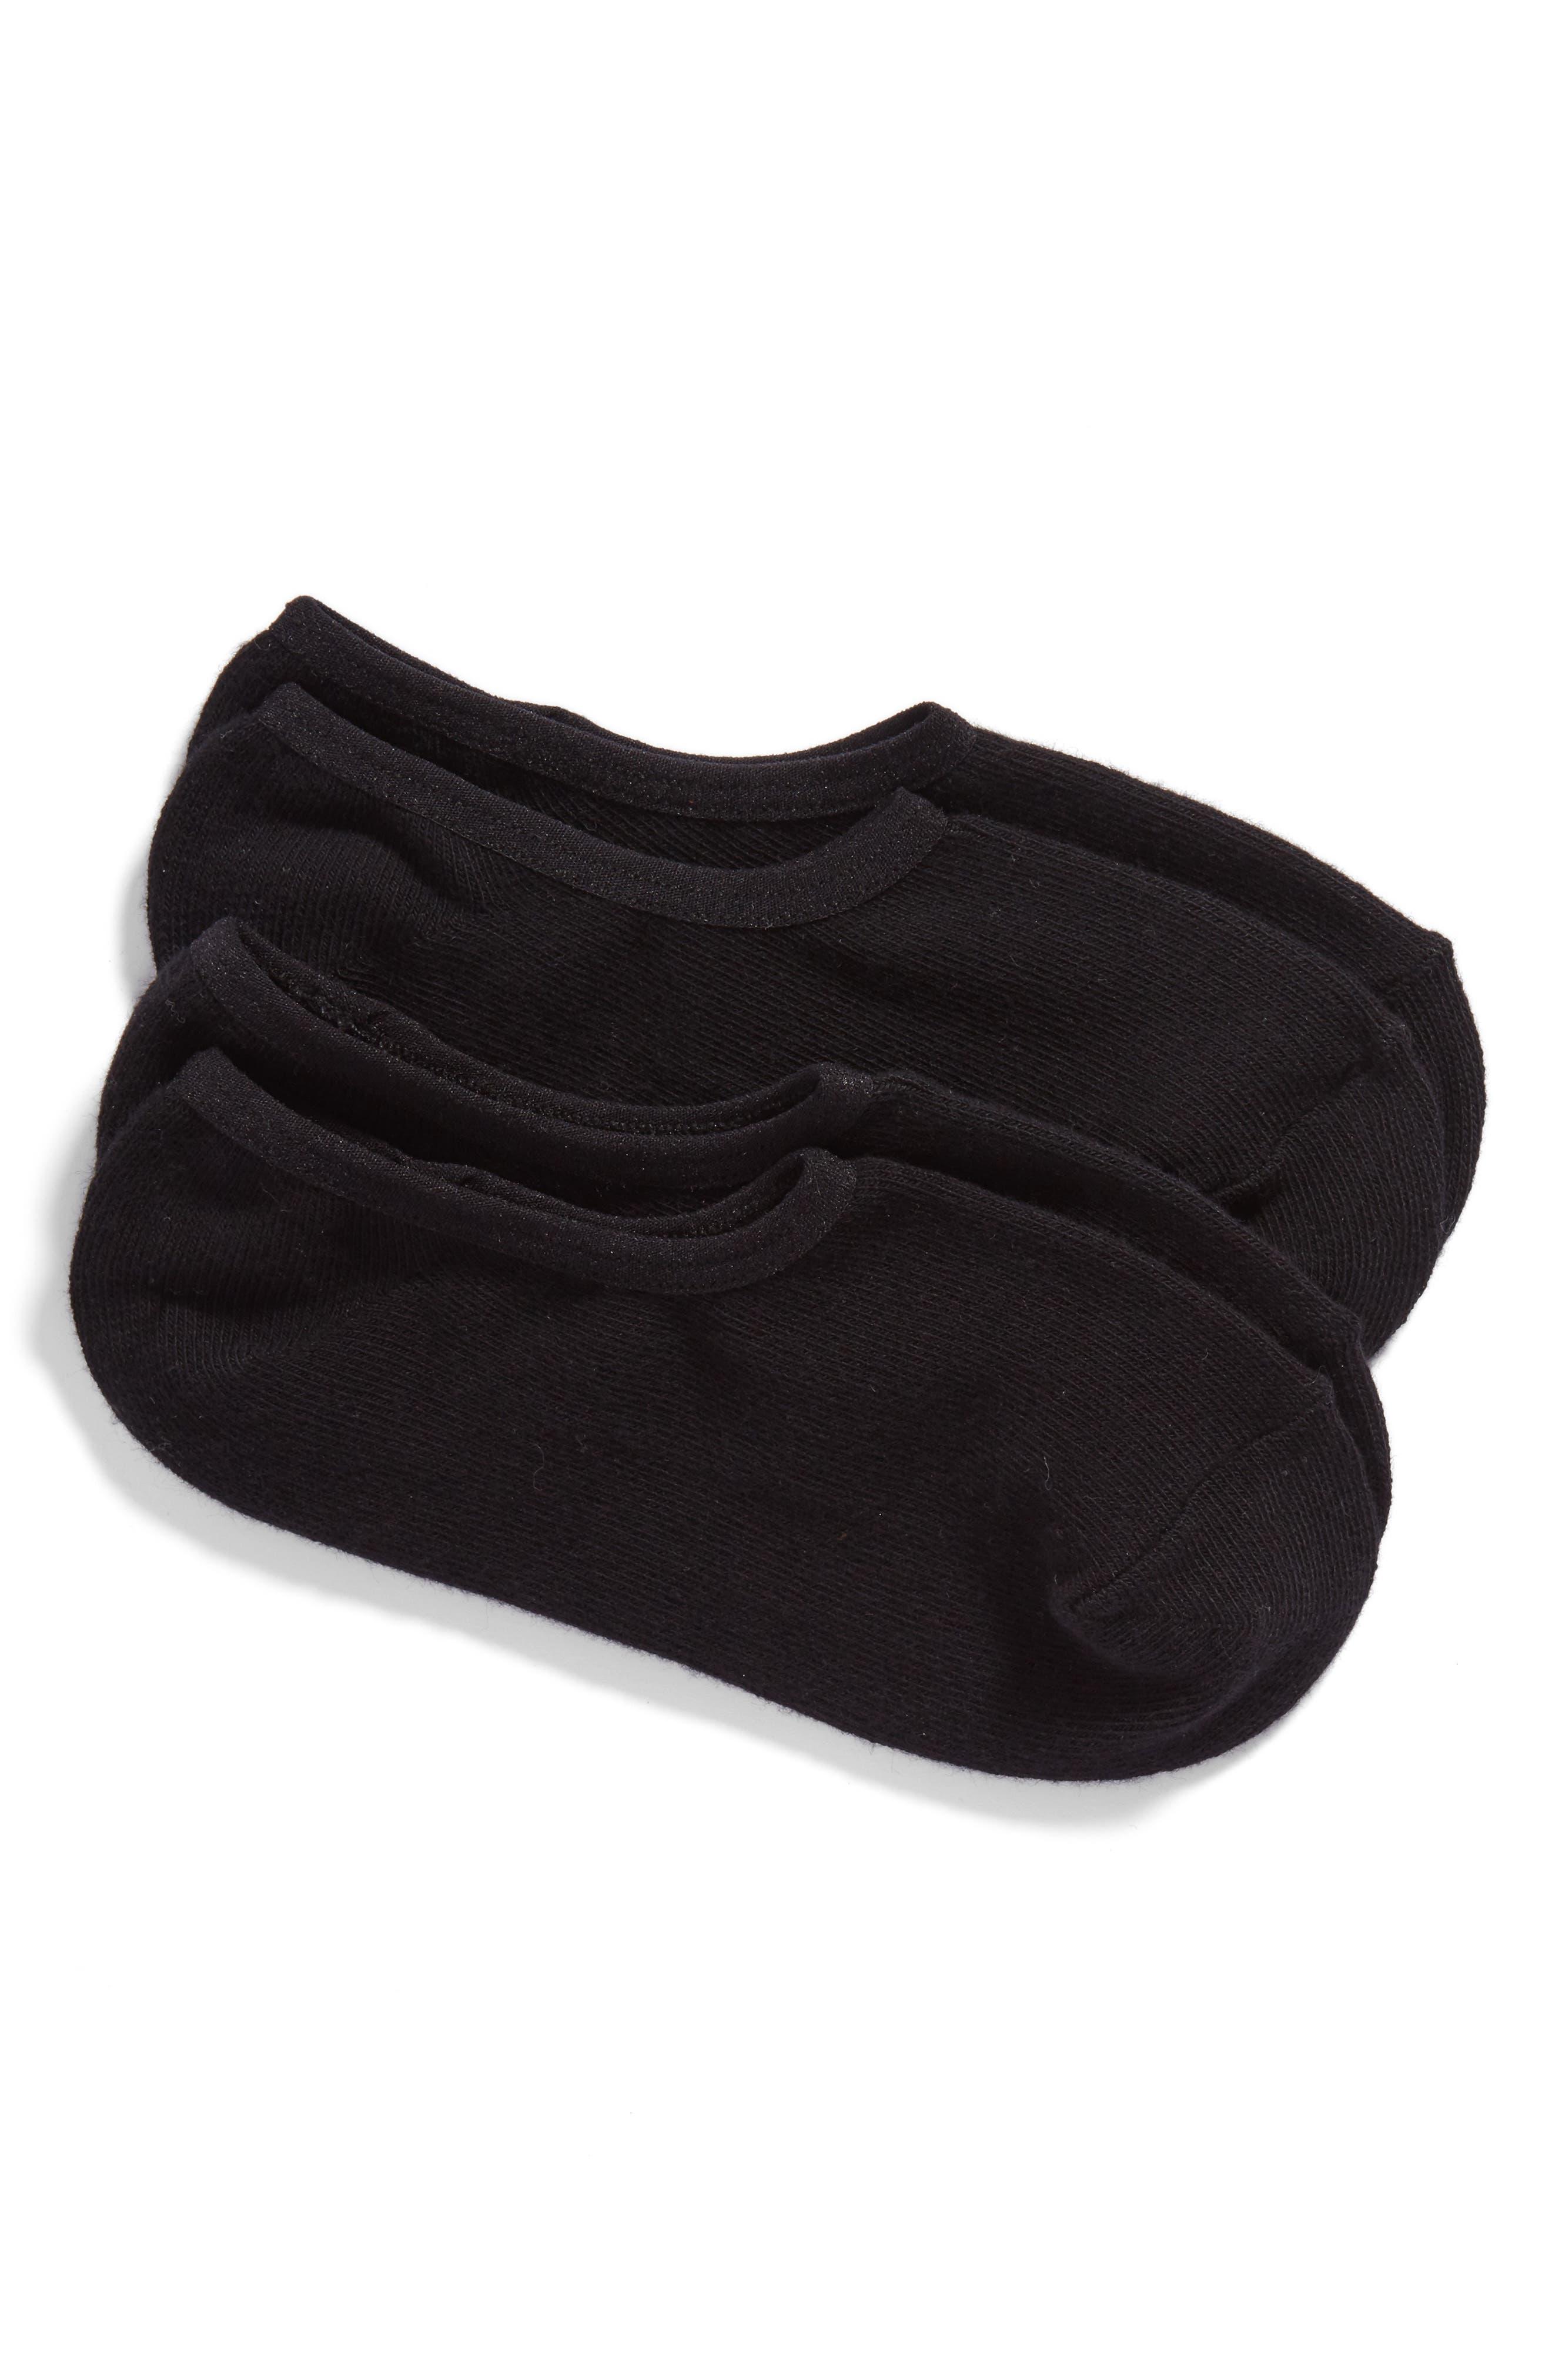 2-Pack Liner Socks,                             Main thumbnail 1, color,